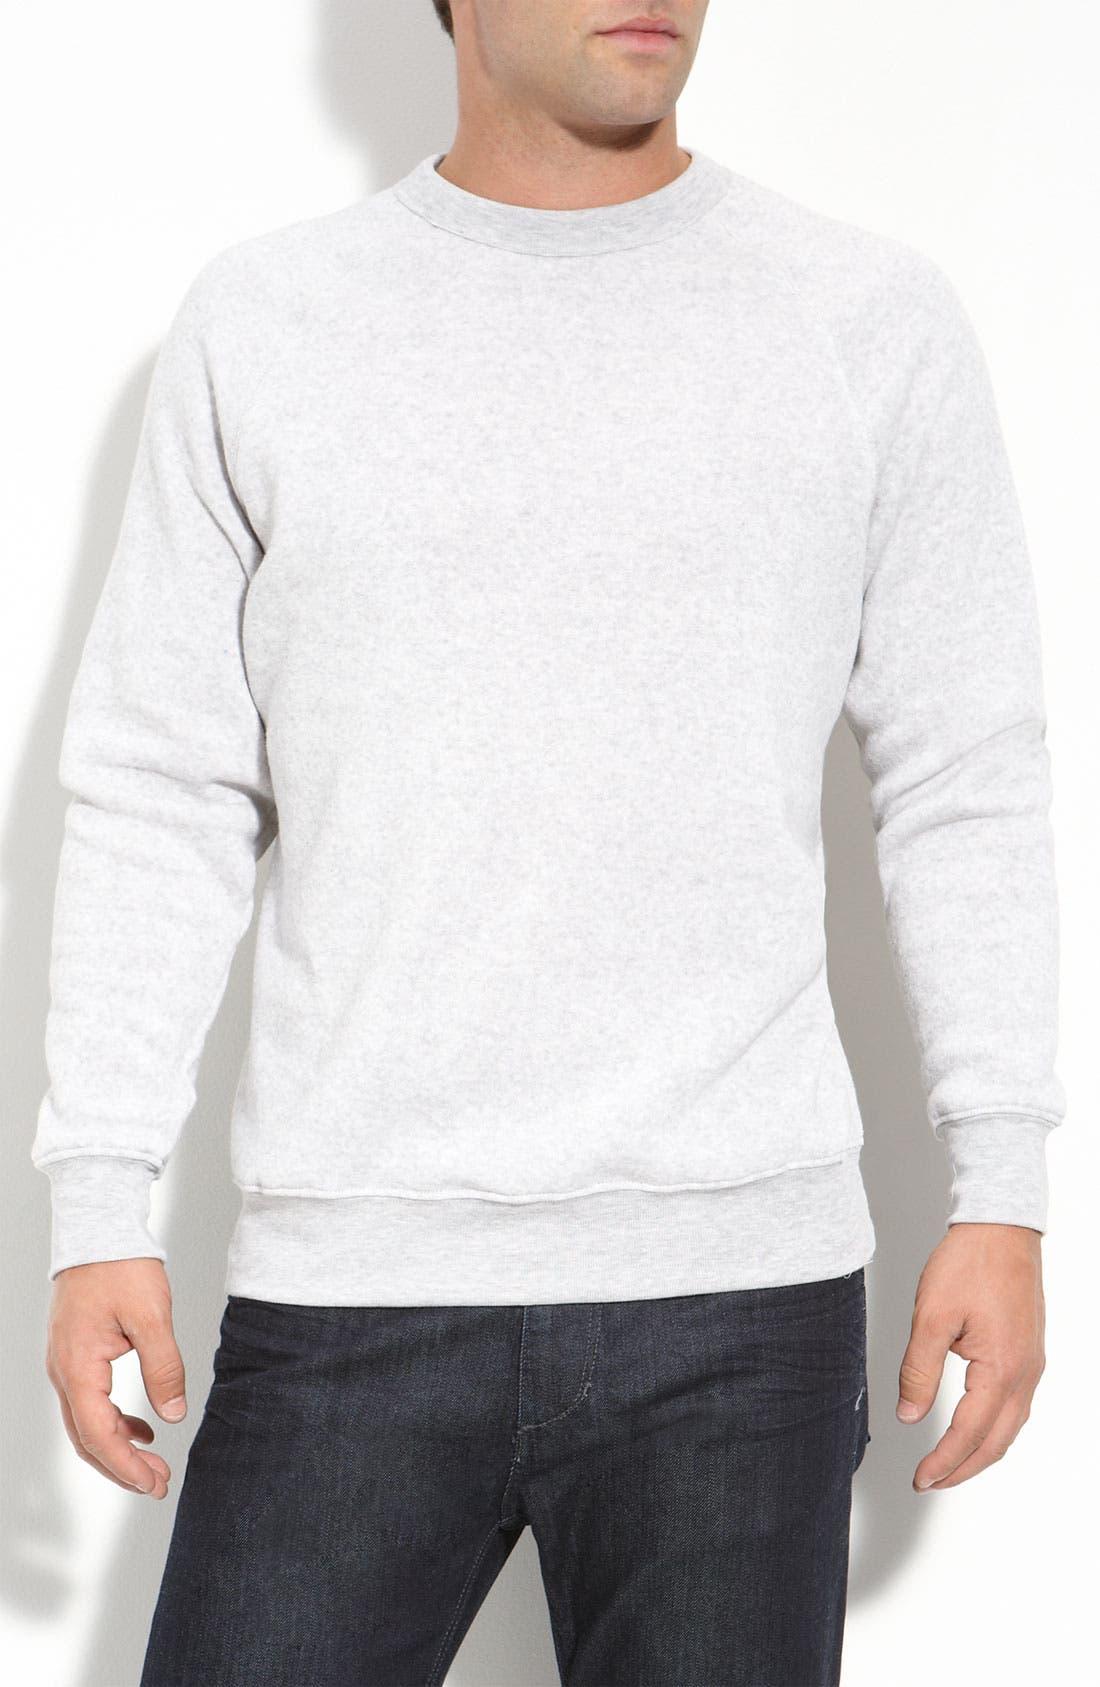 'The Champ' Sweatshirt,                             Main thumbnail 4, color,